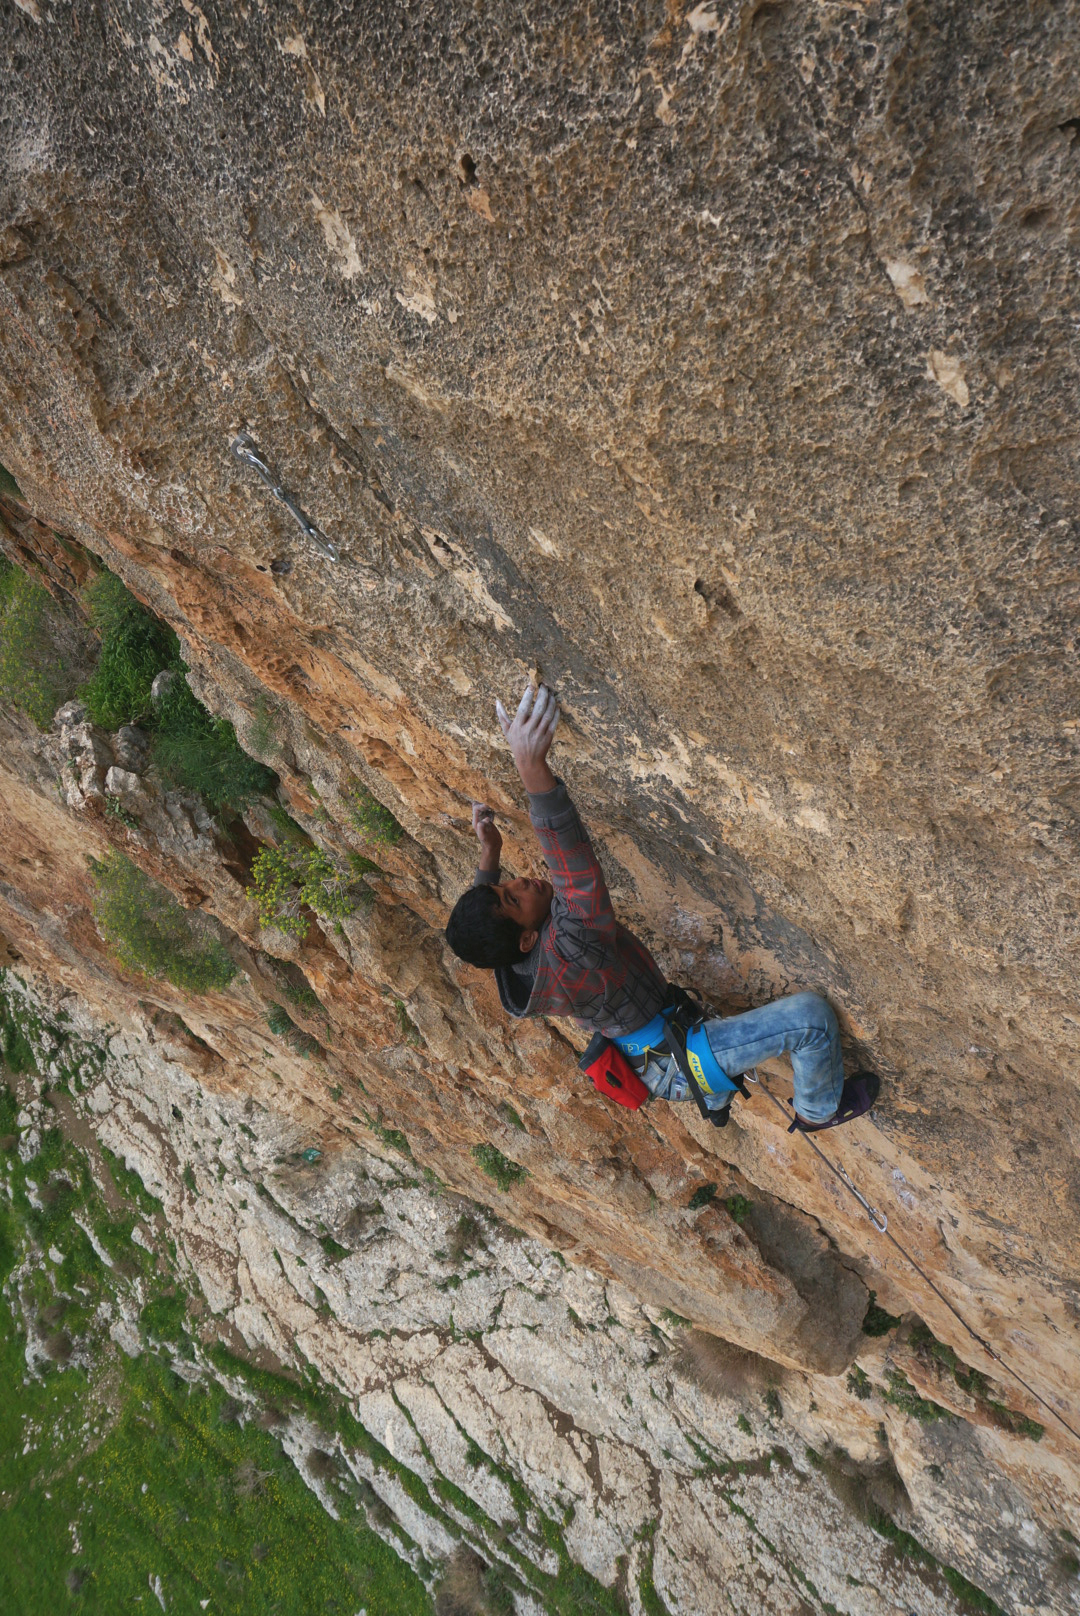 Twfyq, a Palestinian climber, on an Israeli route at Ein Fara. Photo: Miranda Oakley.